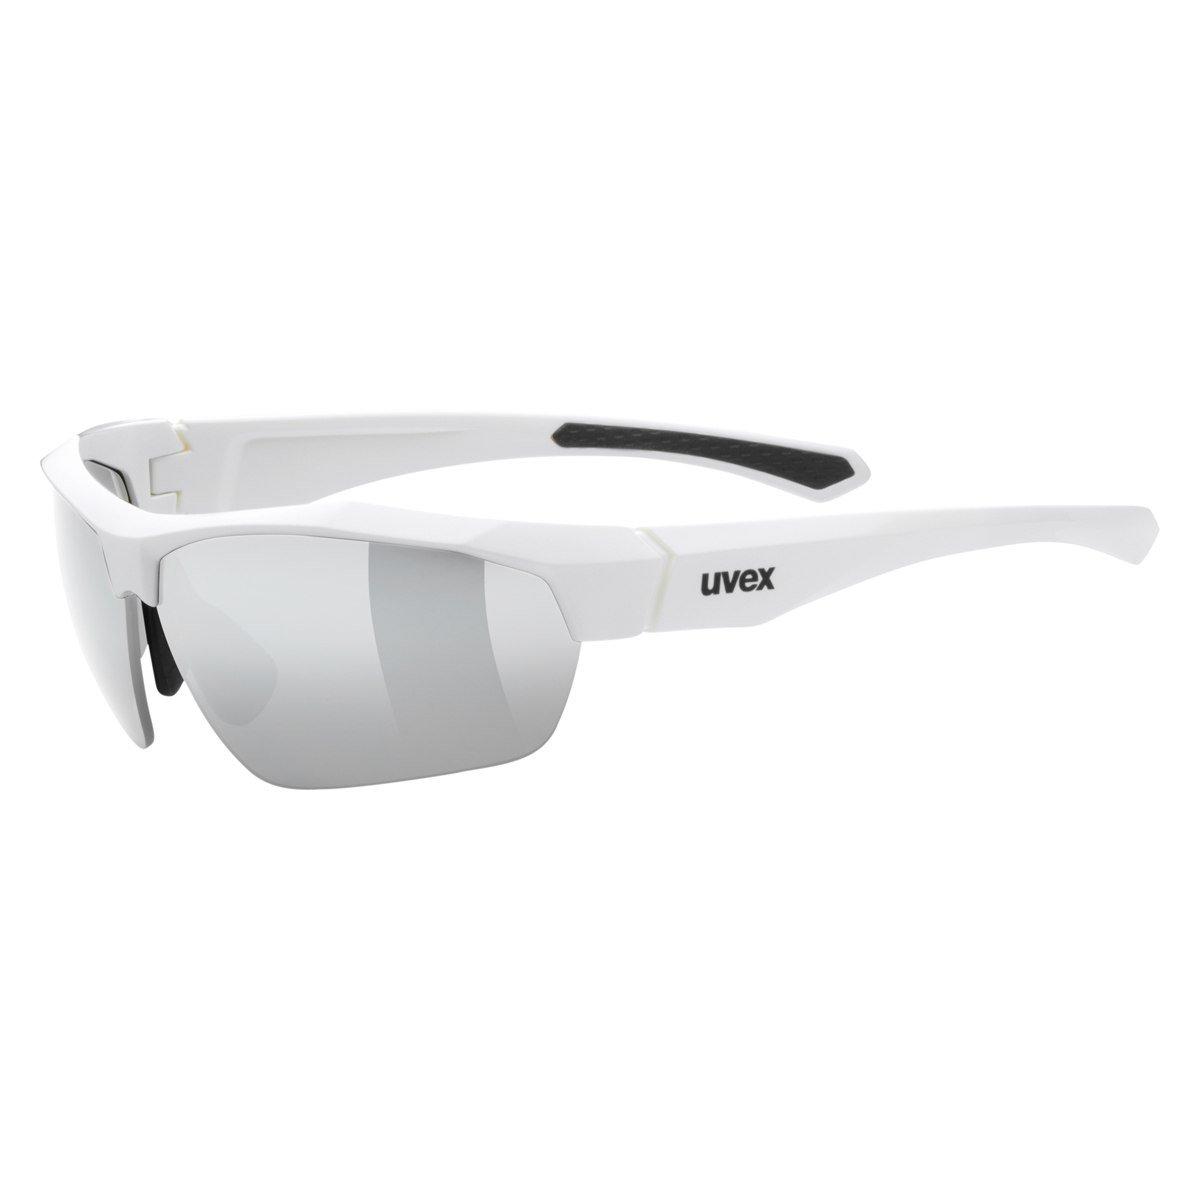 Uvex Sportsonnenbrille Sportstyle 216, Black, One Size, 5308832216